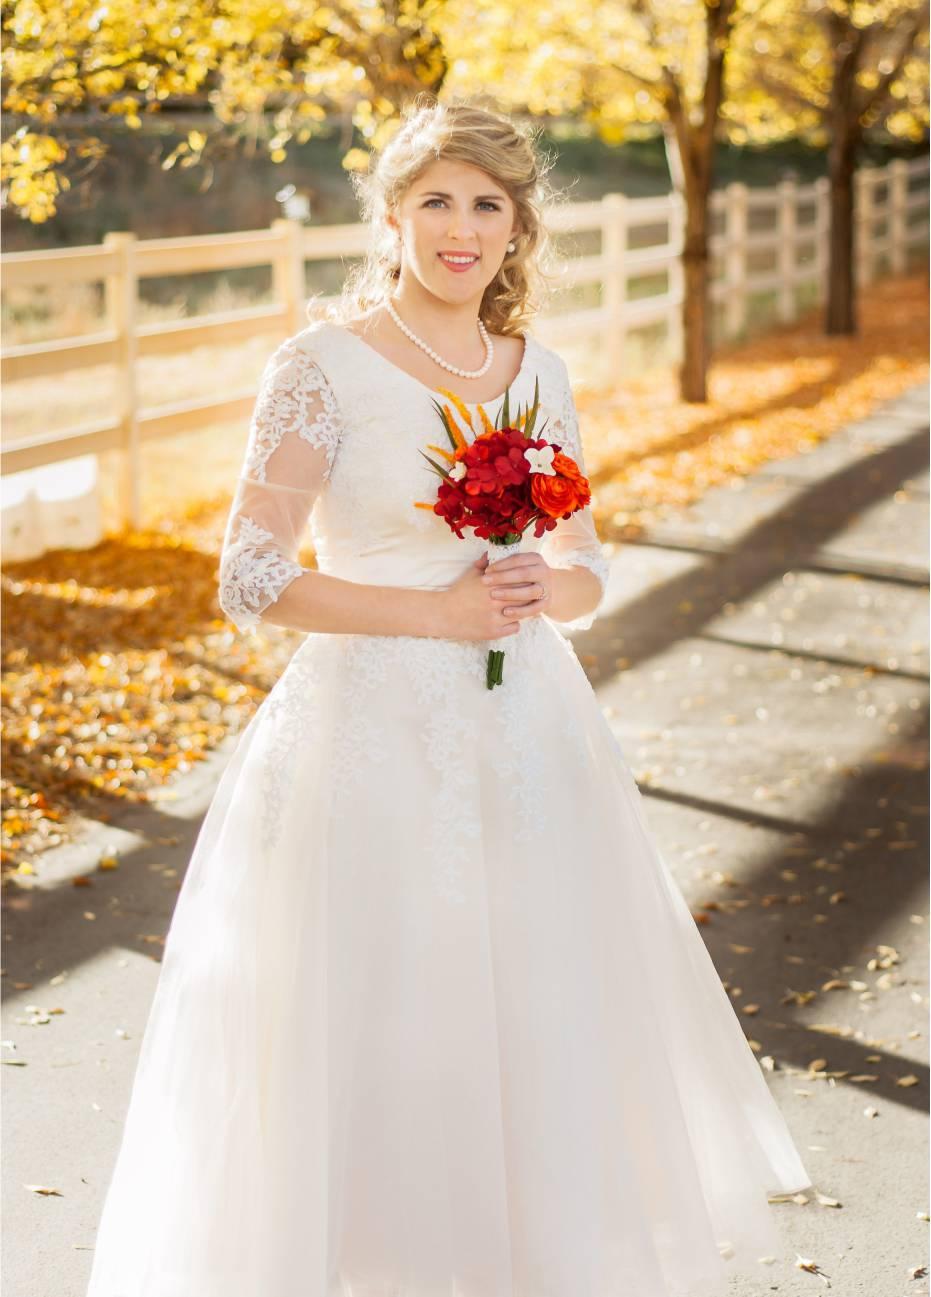 Bride Emily in custom-made wedding dress